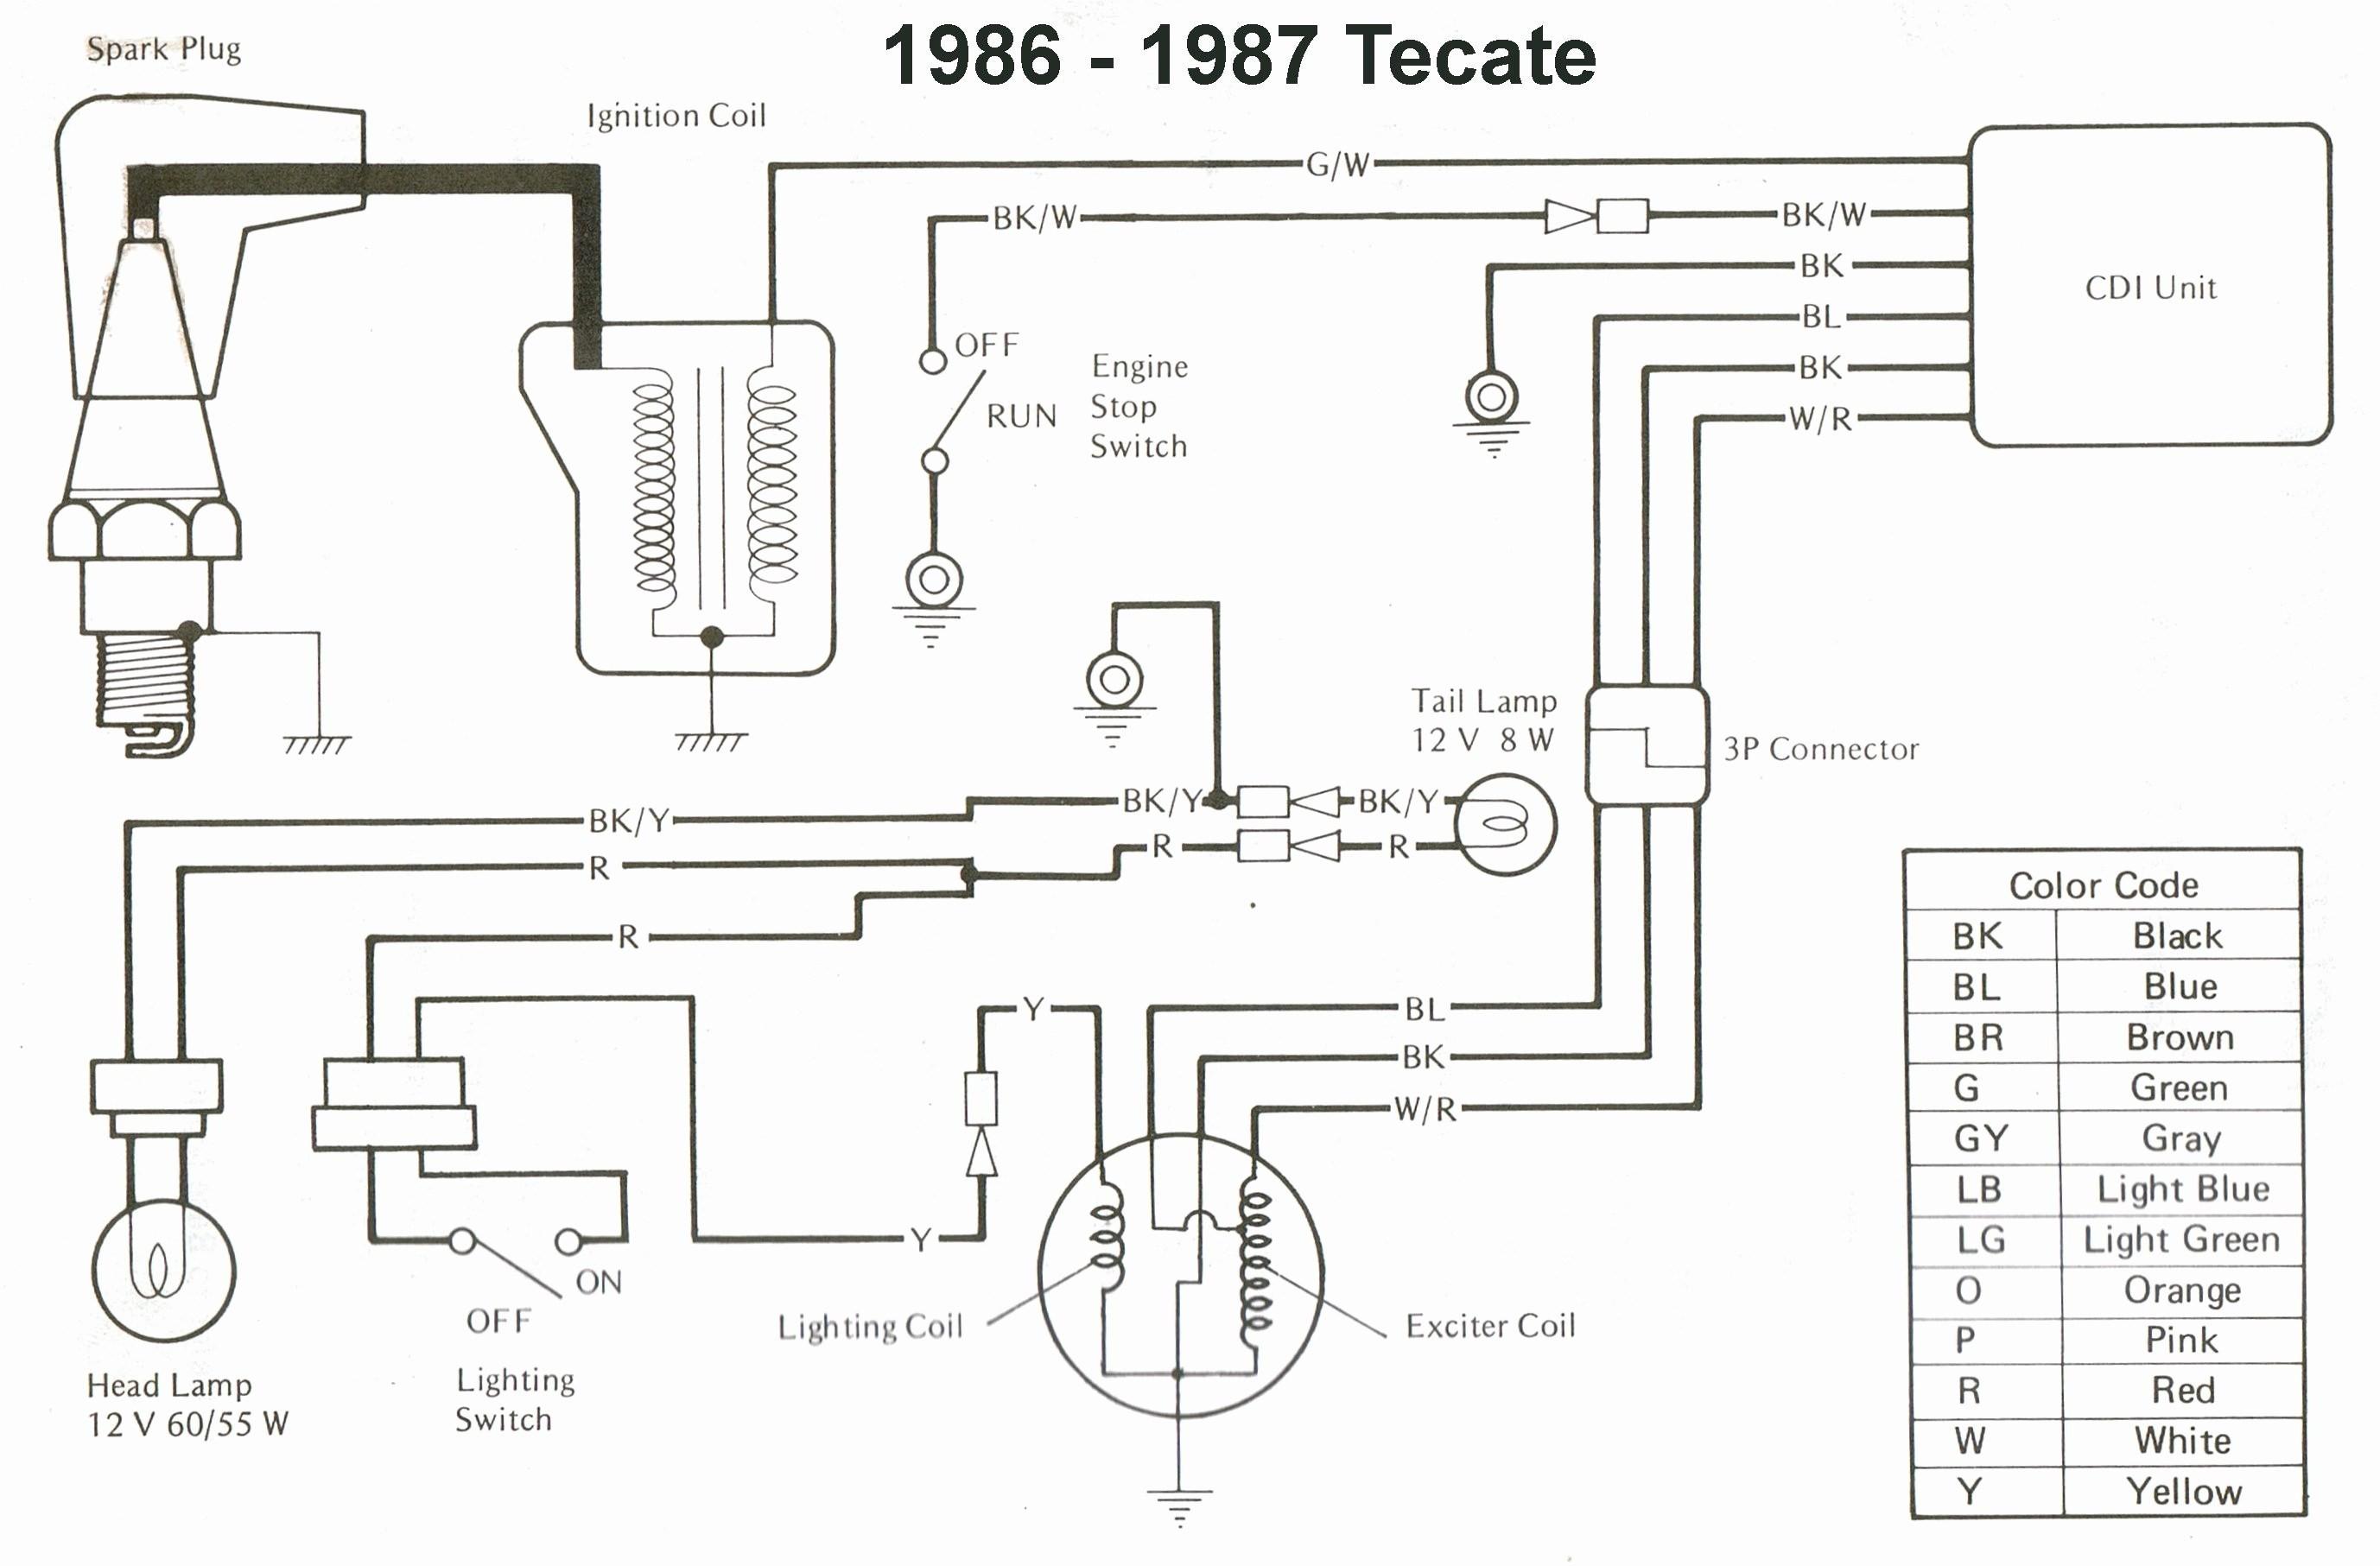 Wiring Diagram for Predator 420cc Ohv Scotts 1742g Wiring Diagram Of Wiring Diagram for Predator 420cc Ohv